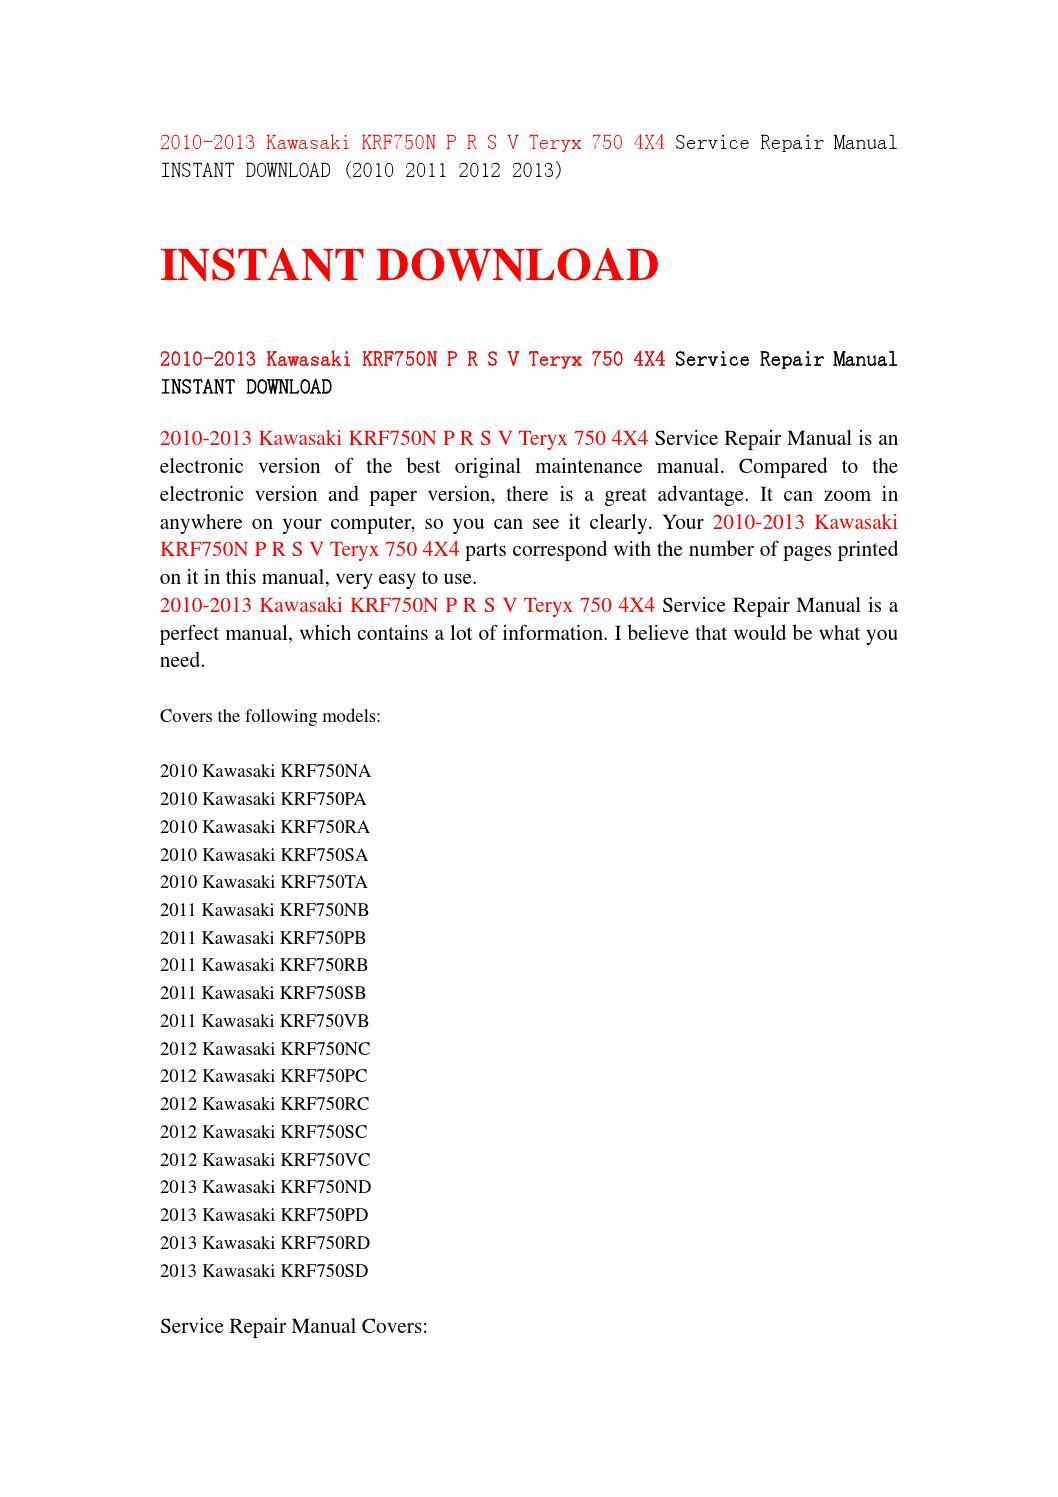 ... Array - boeing standard overhaul practices manual ebook rh boeing  standard overhaul practices manual ebo